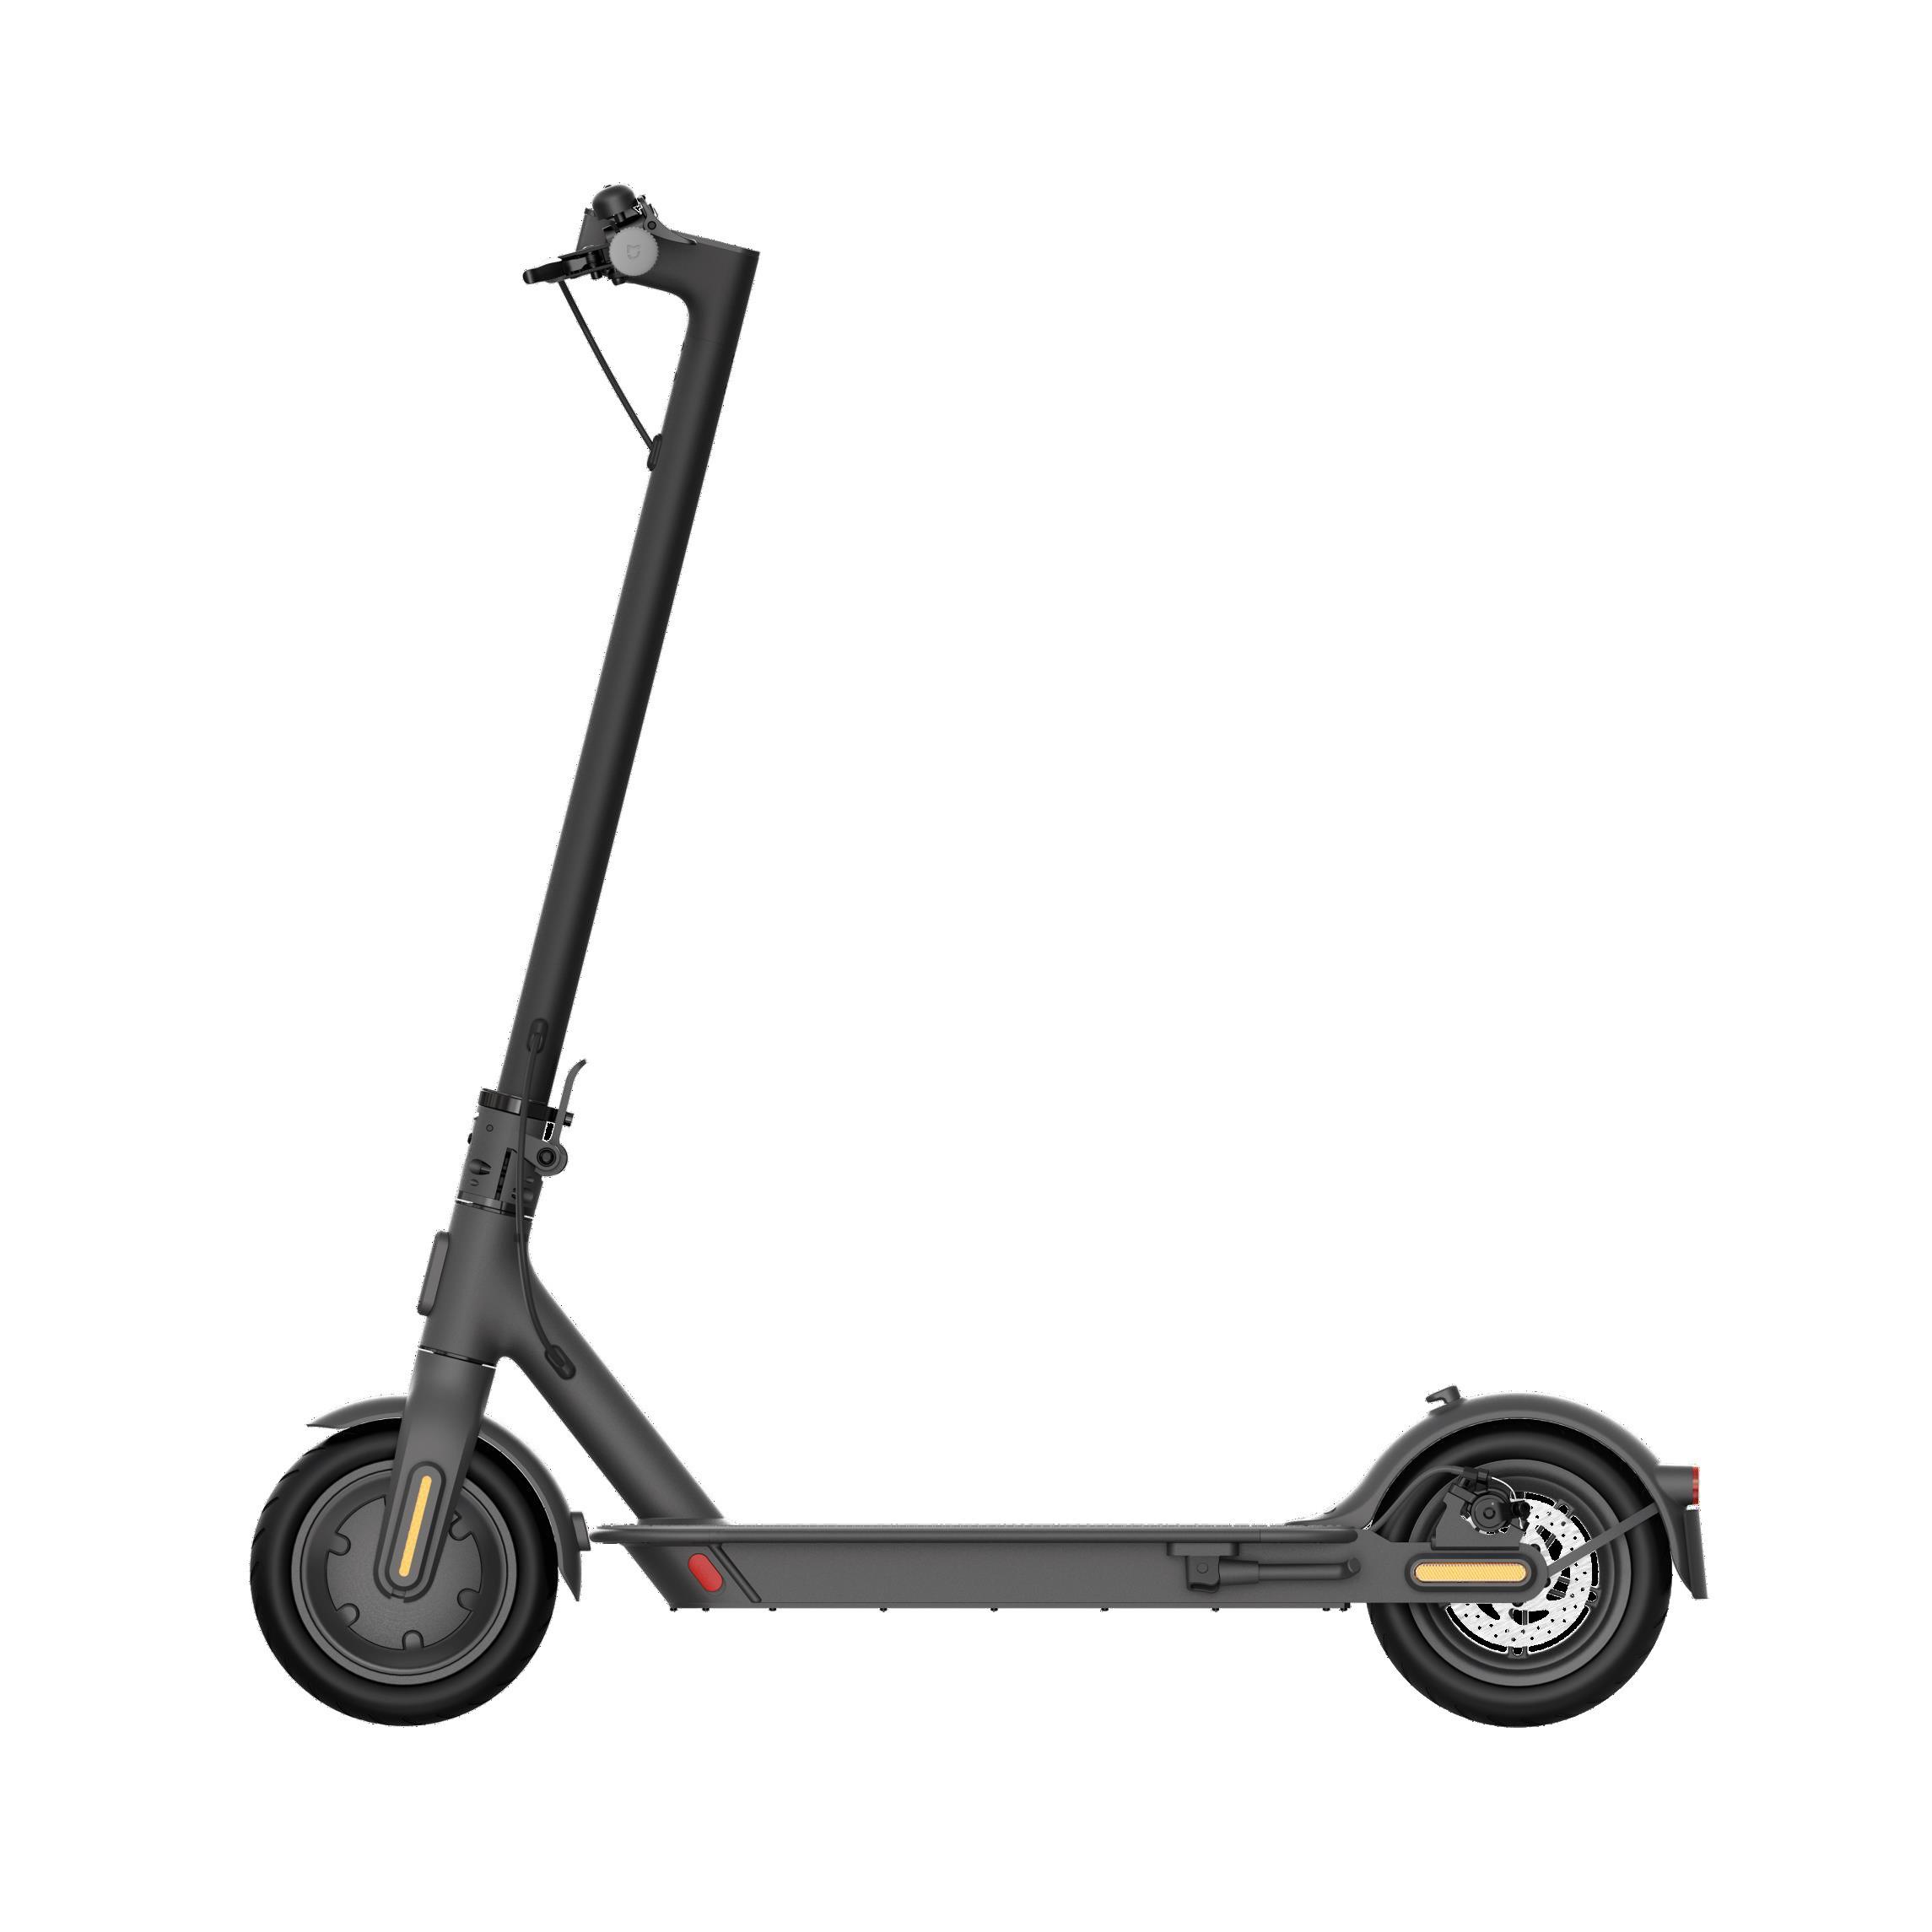 Patinete Electrico Xiaomi Mi Electric Scooter 1s Eu